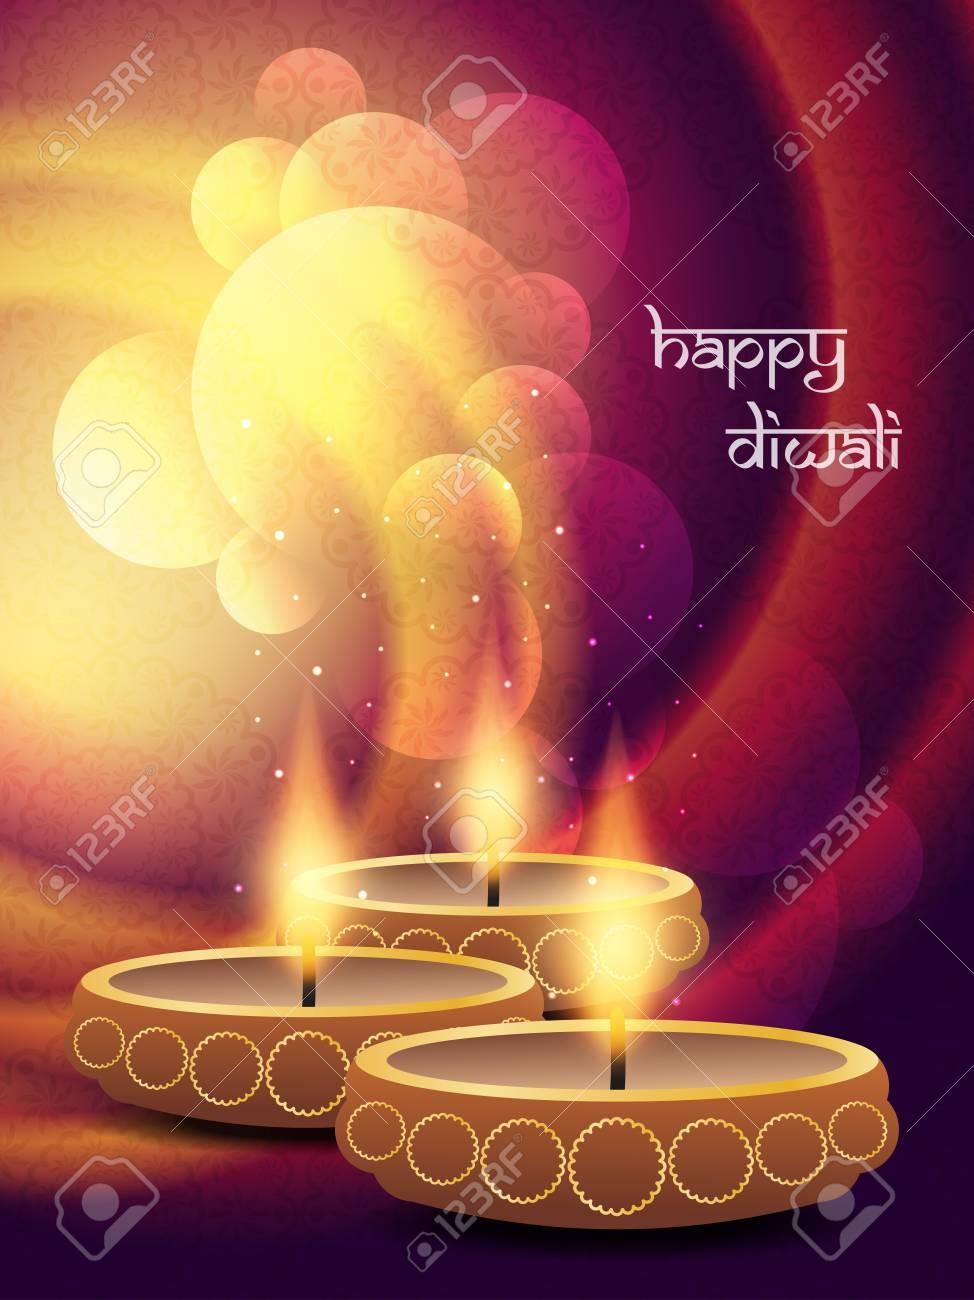 religious background design for Diwali Stock Vector - 21810973